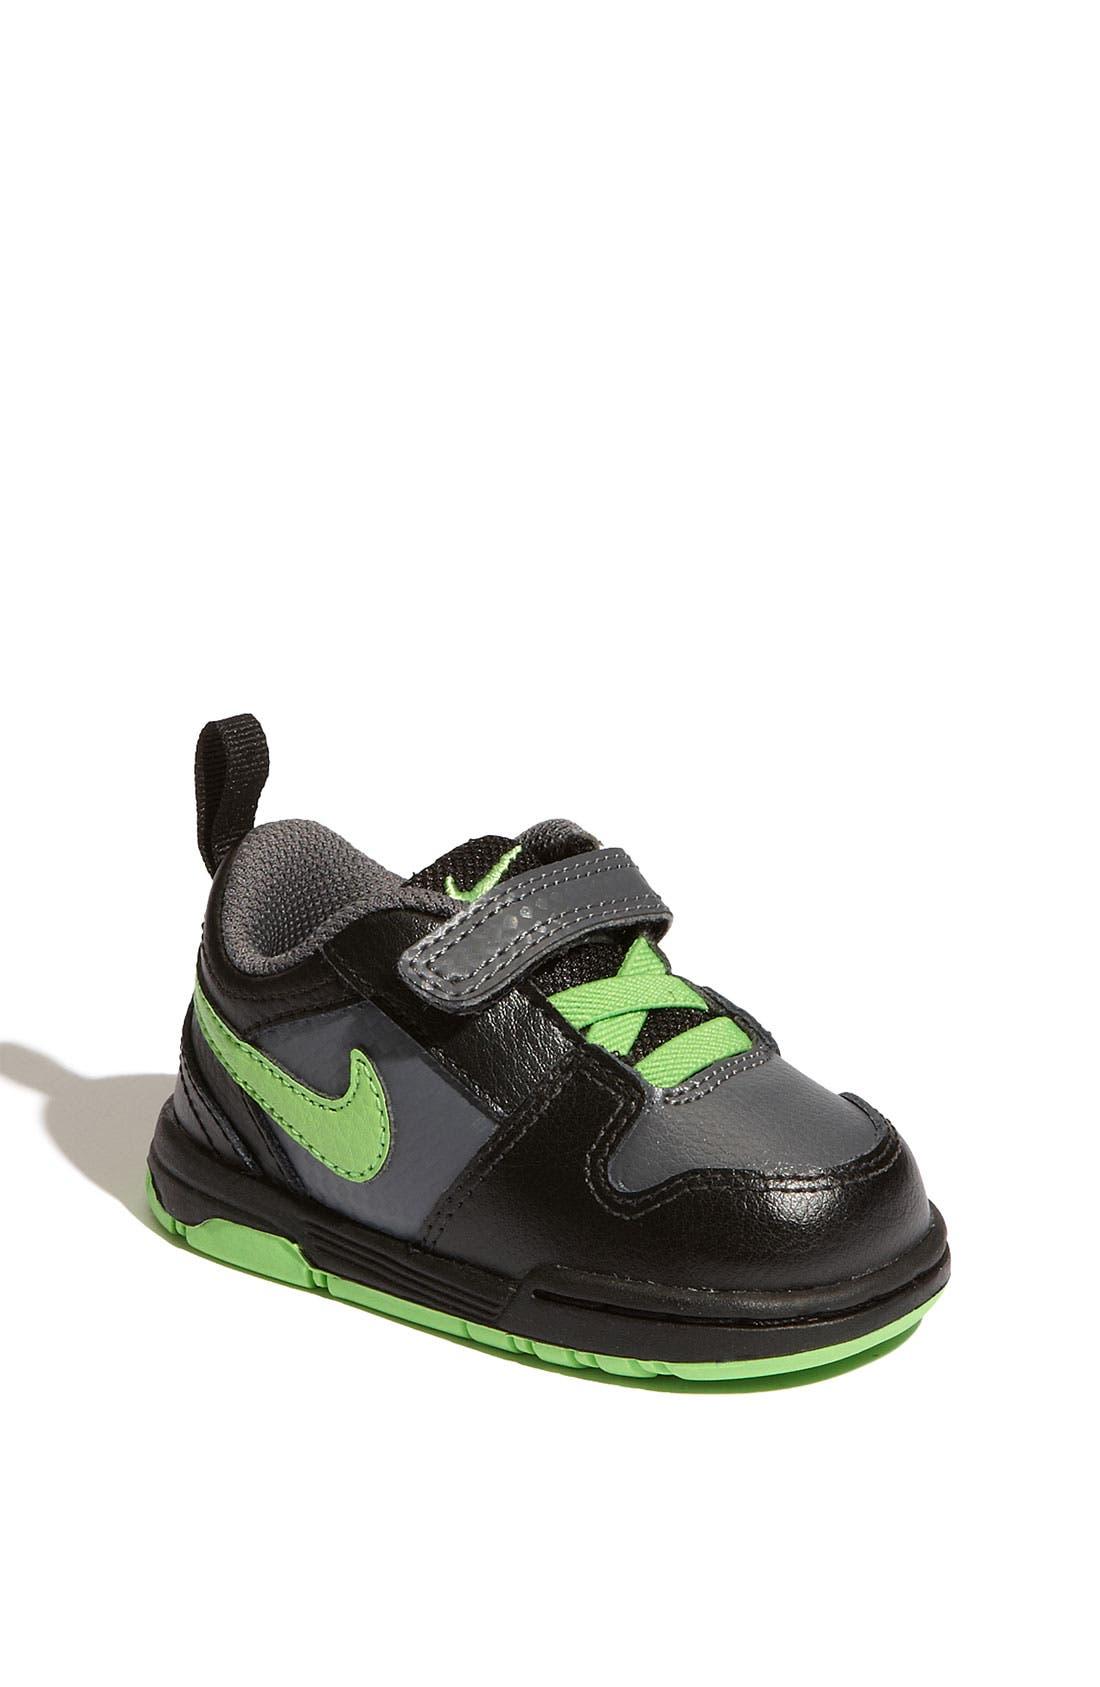 Alternate Image 1 Selected - Nike 'Mogan 3' Sneaker (Walker & Toddler)